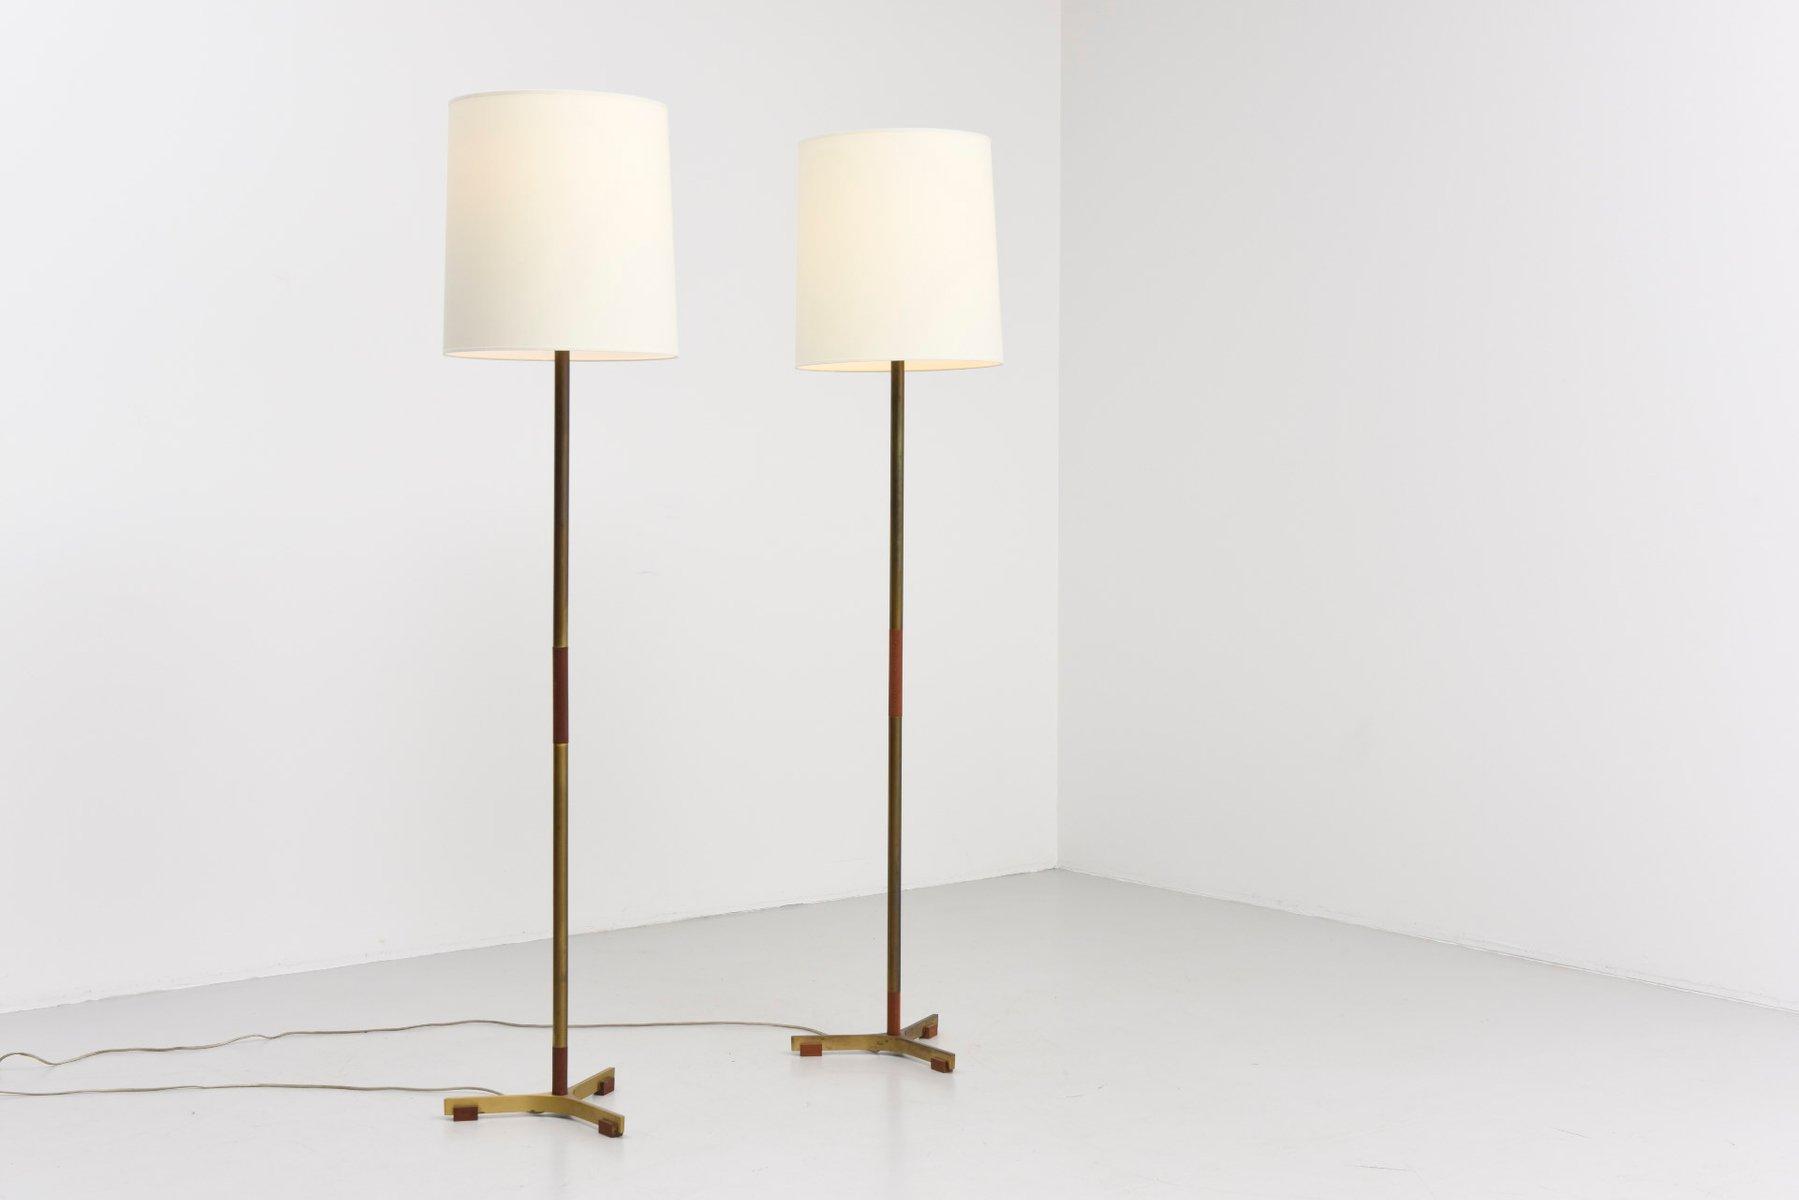 vintage monolit stehlampen von jo hammerborg f r fog m rup 2er set bei pamono kaufen. Black Bedroom Furniture Sets. Home Design Ideas